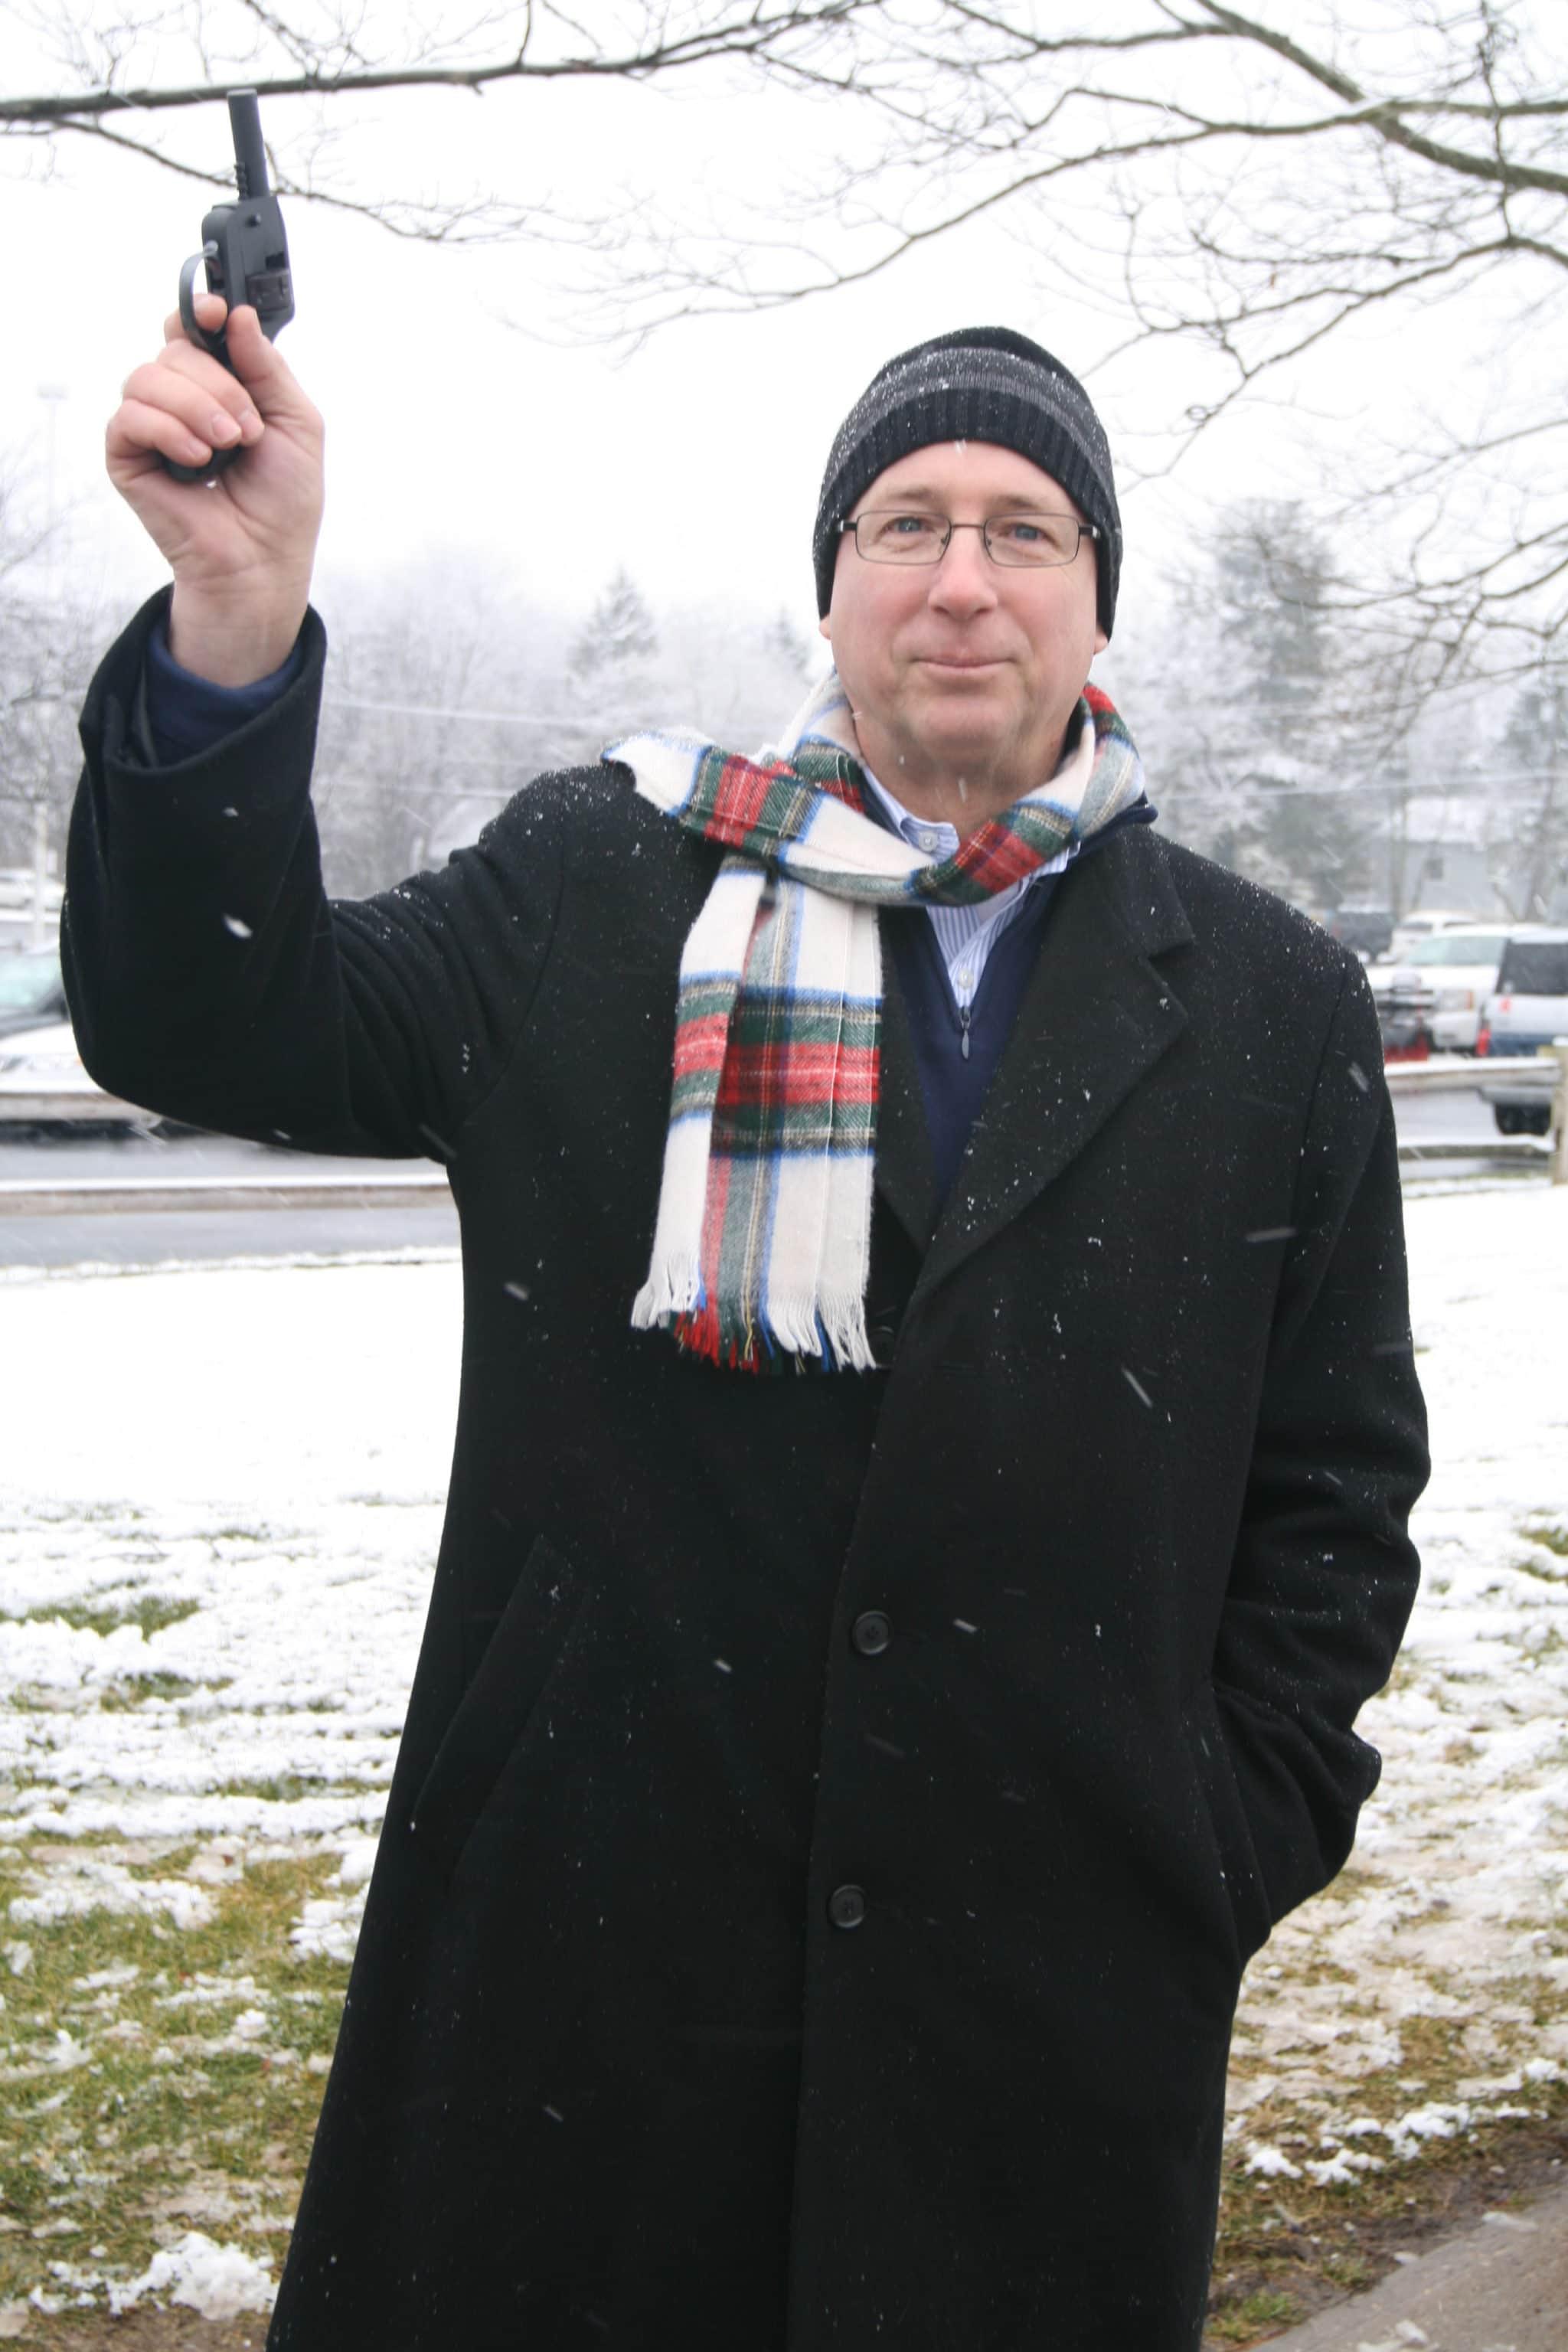 Featured in photo: Greg Hritz, Hadleman Ford, Shoots the gun to start the Princeton, NJ run.